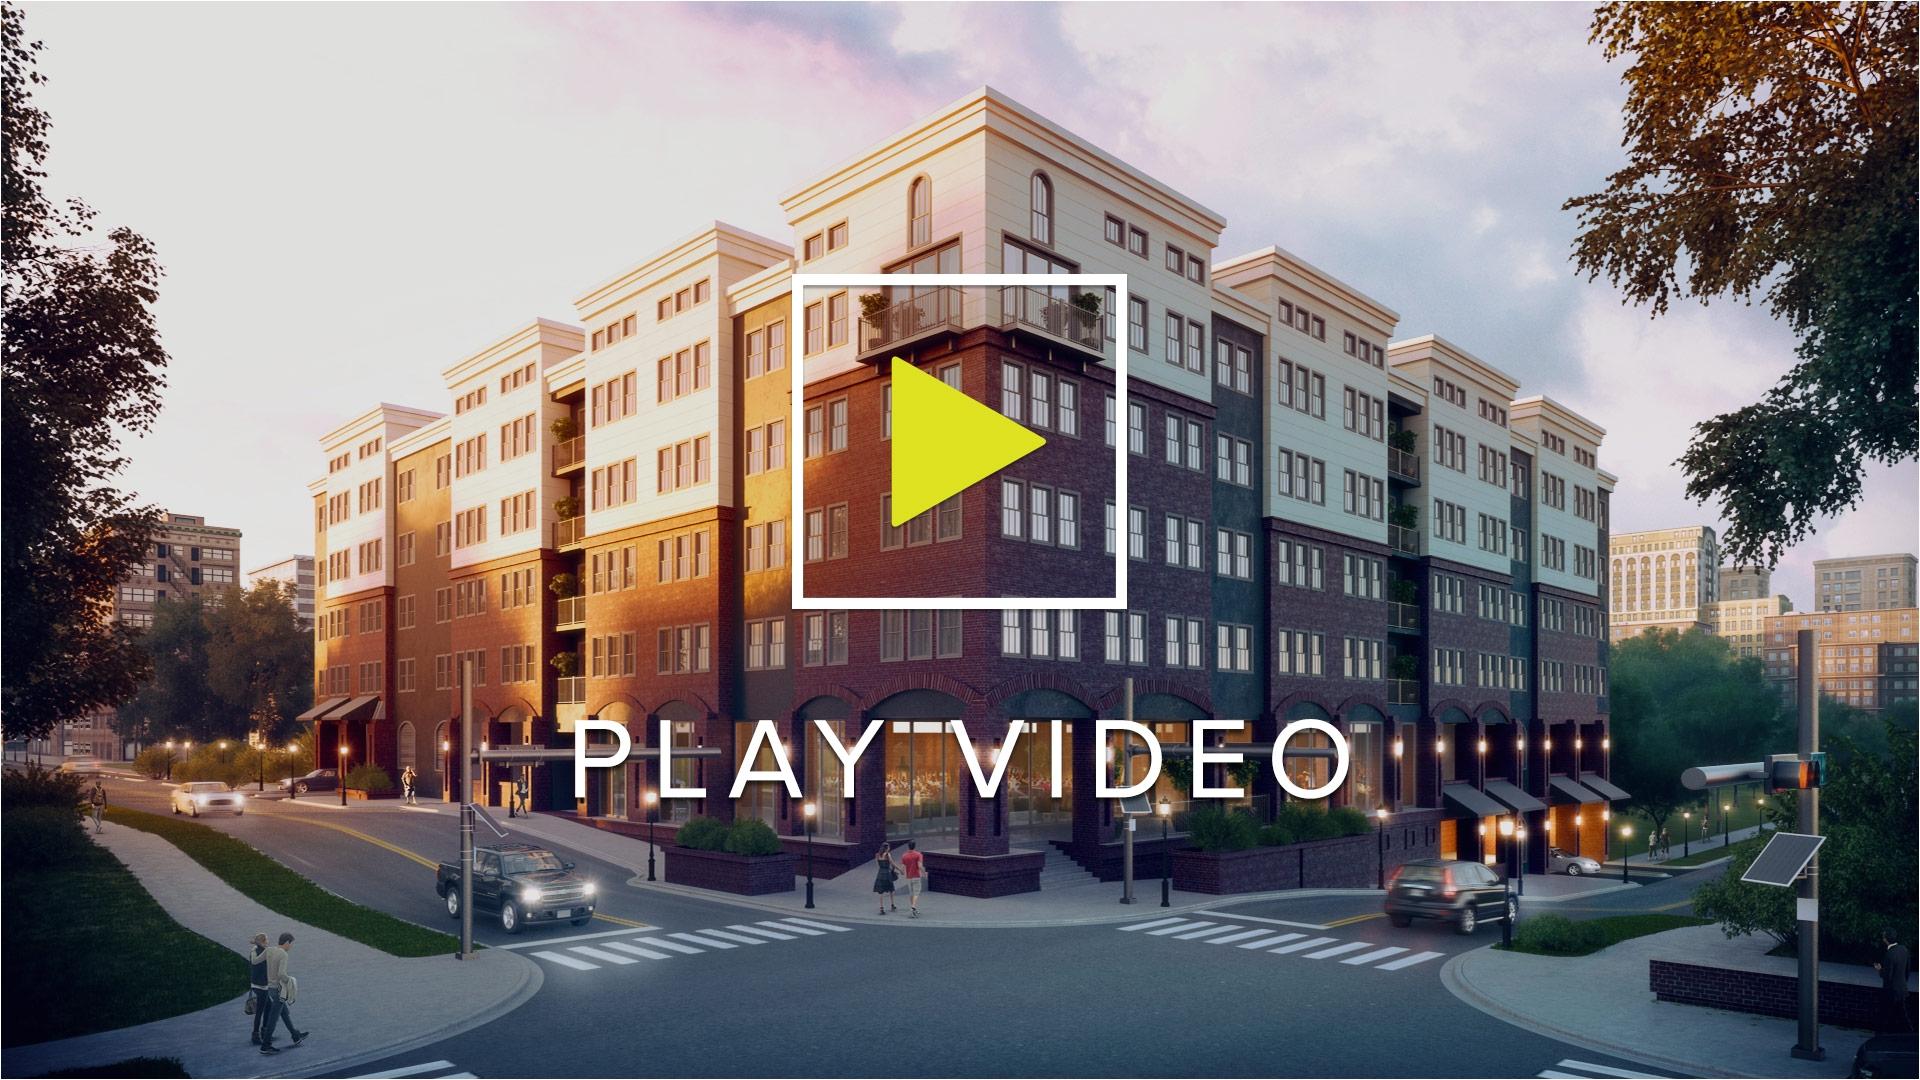 1 Bedroom Apartments Downtown Greenville Sc Perimeter Downtown Condos Real Estate Greenville south Carolina